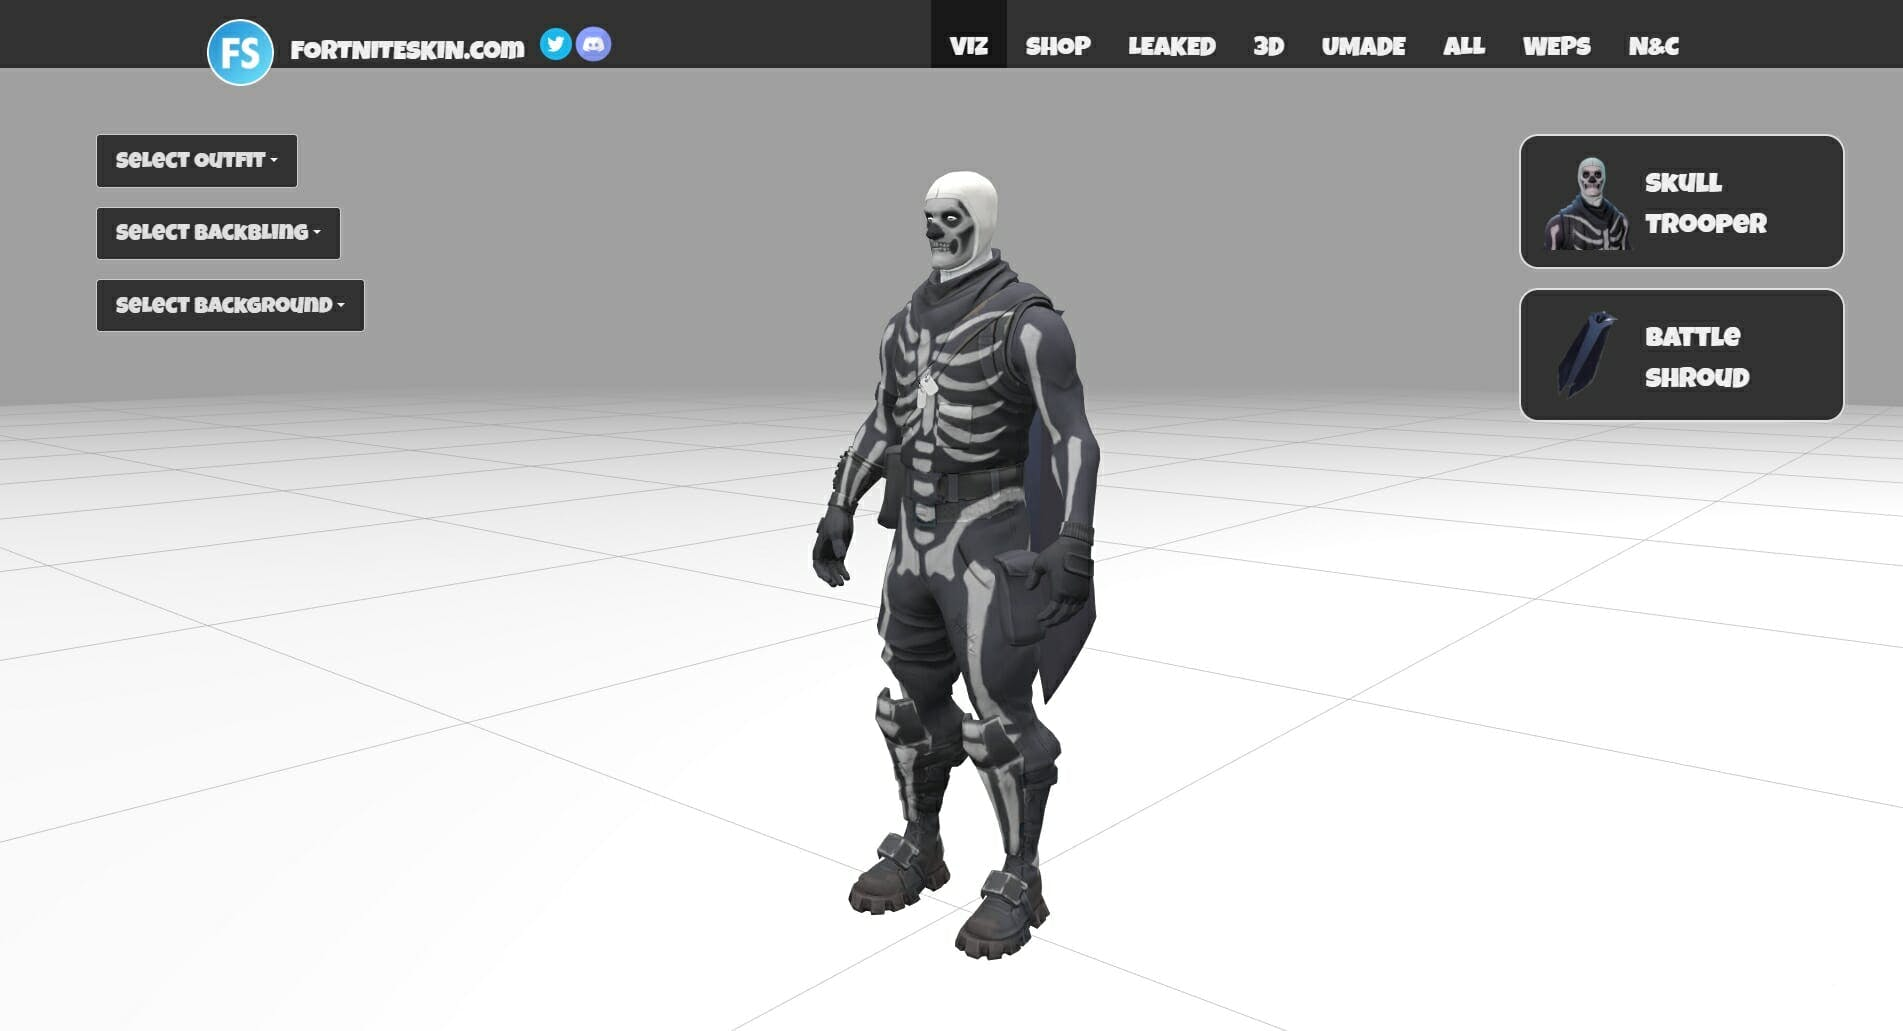 Fortnite Skin's 3D visualizer in action.